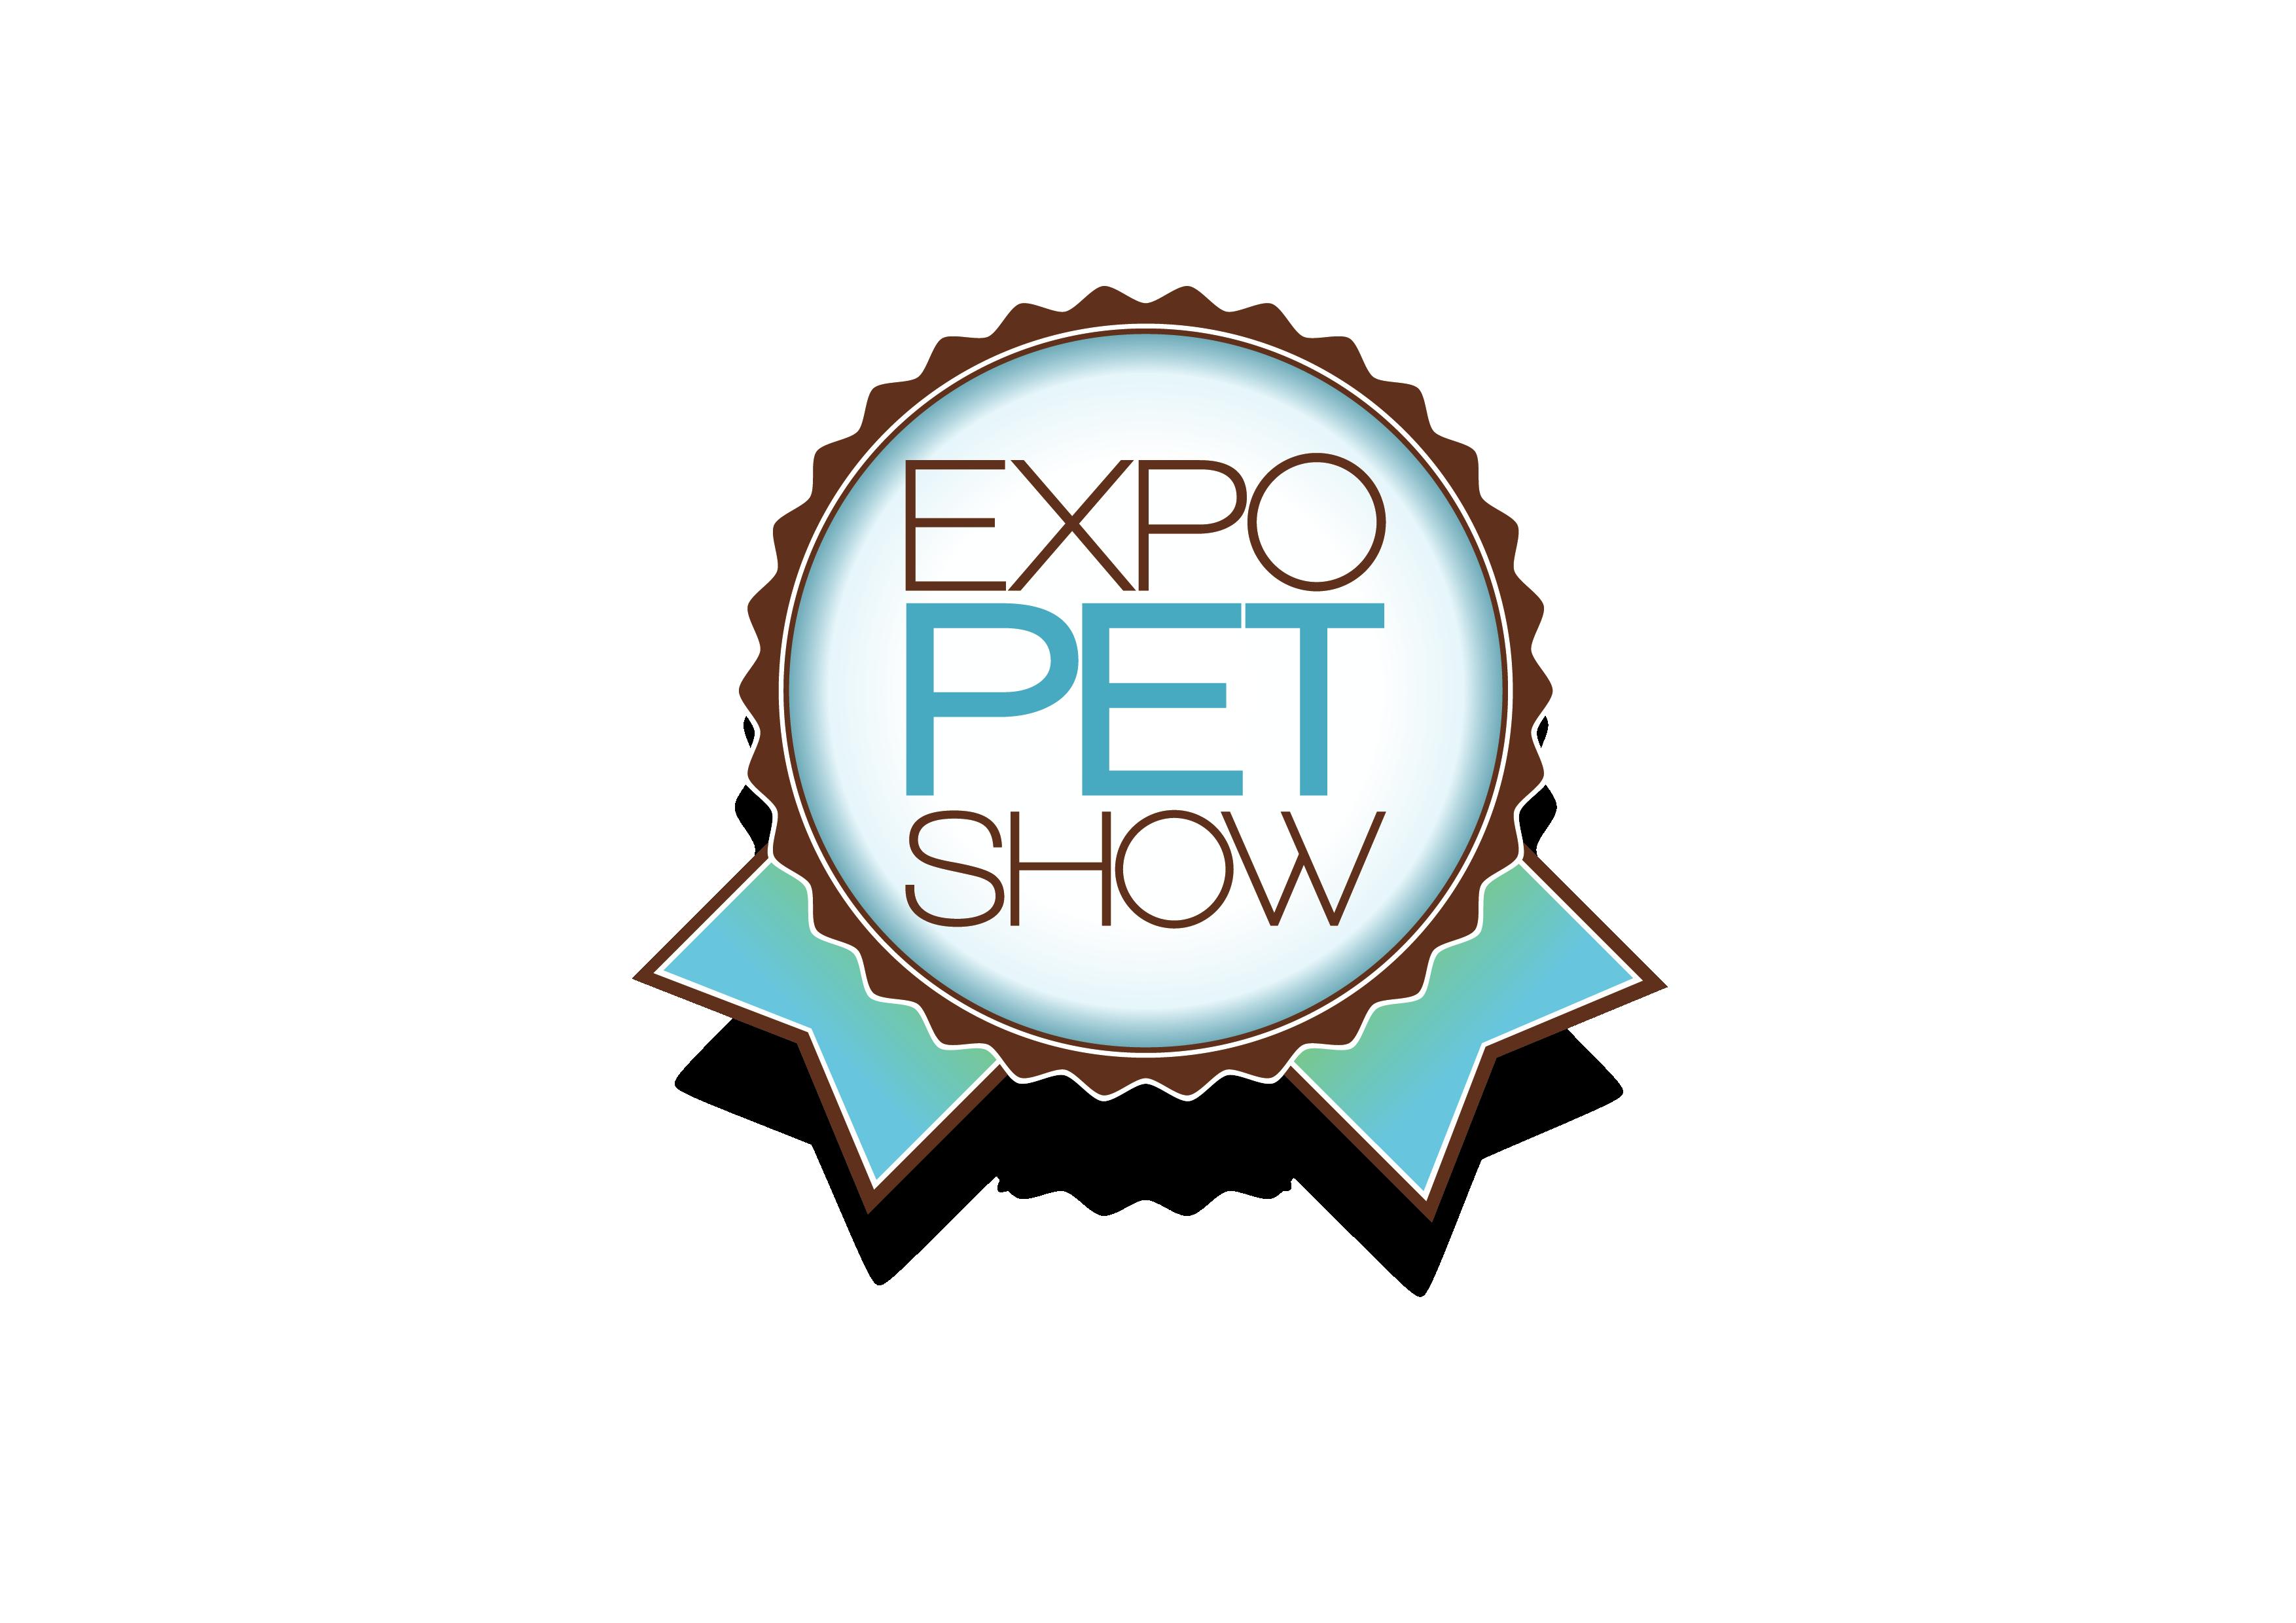 Expo Pet Show - Feira PET